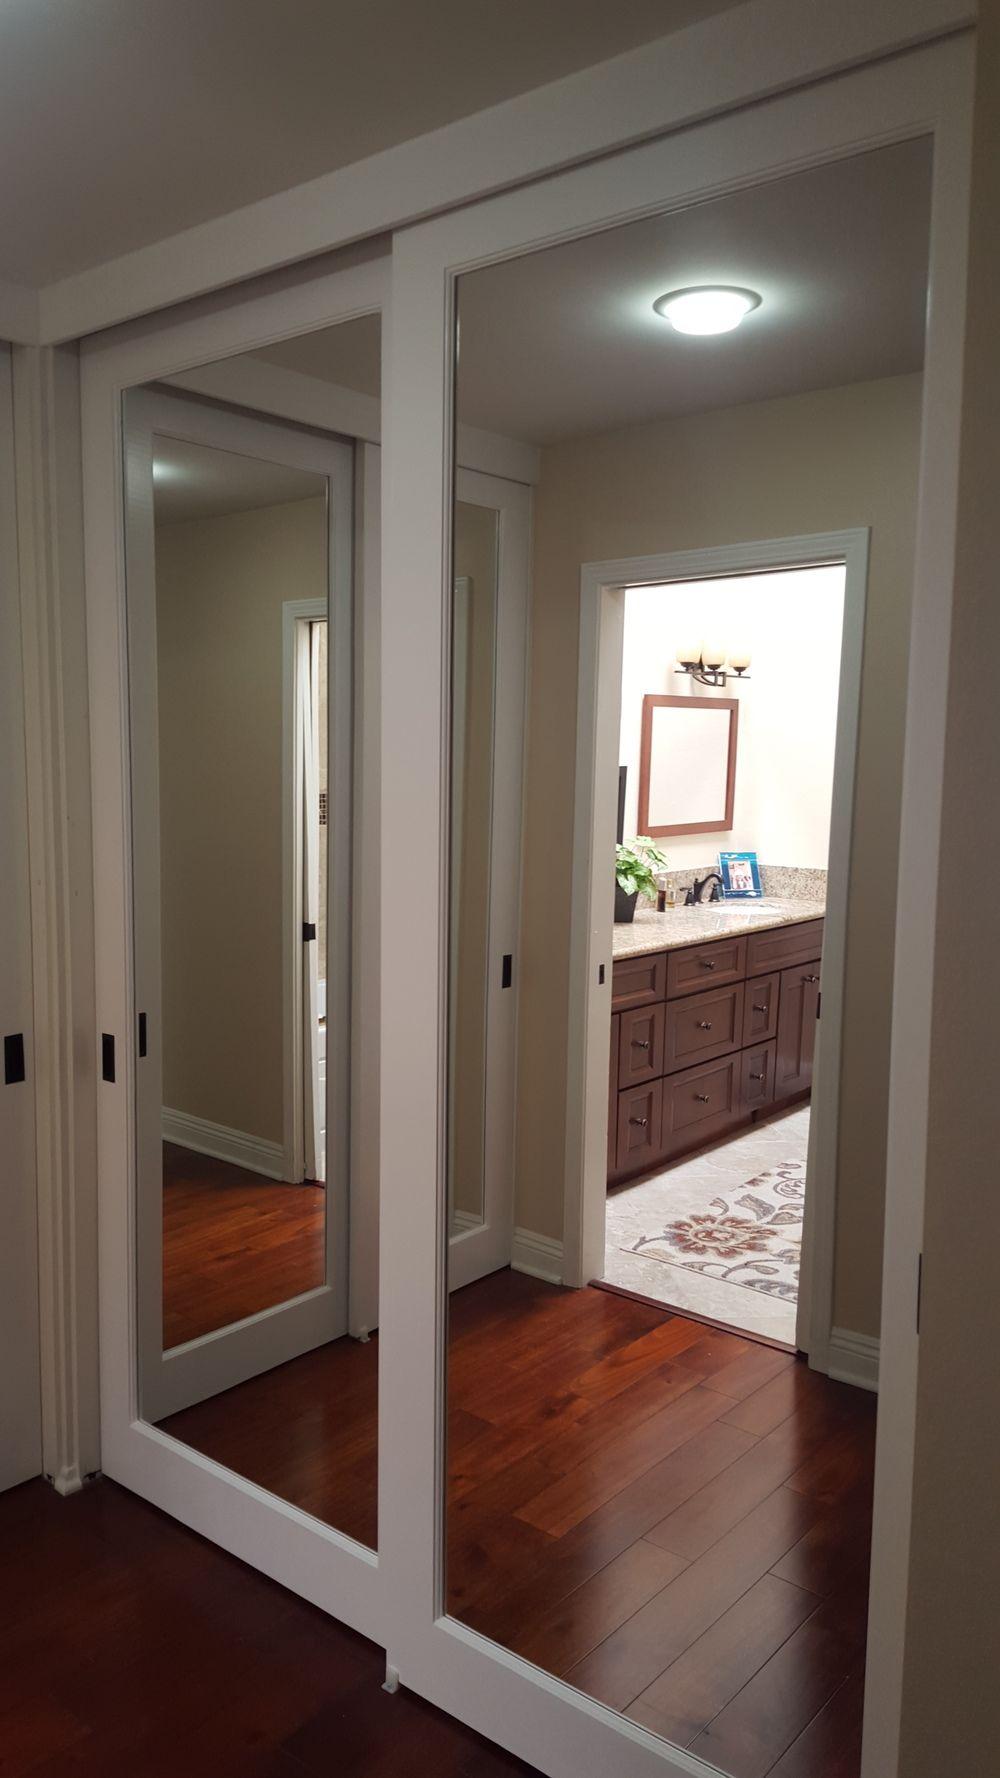 Mirrored Closet Doors Stuff To Buy Closet Doors Mirror Closet